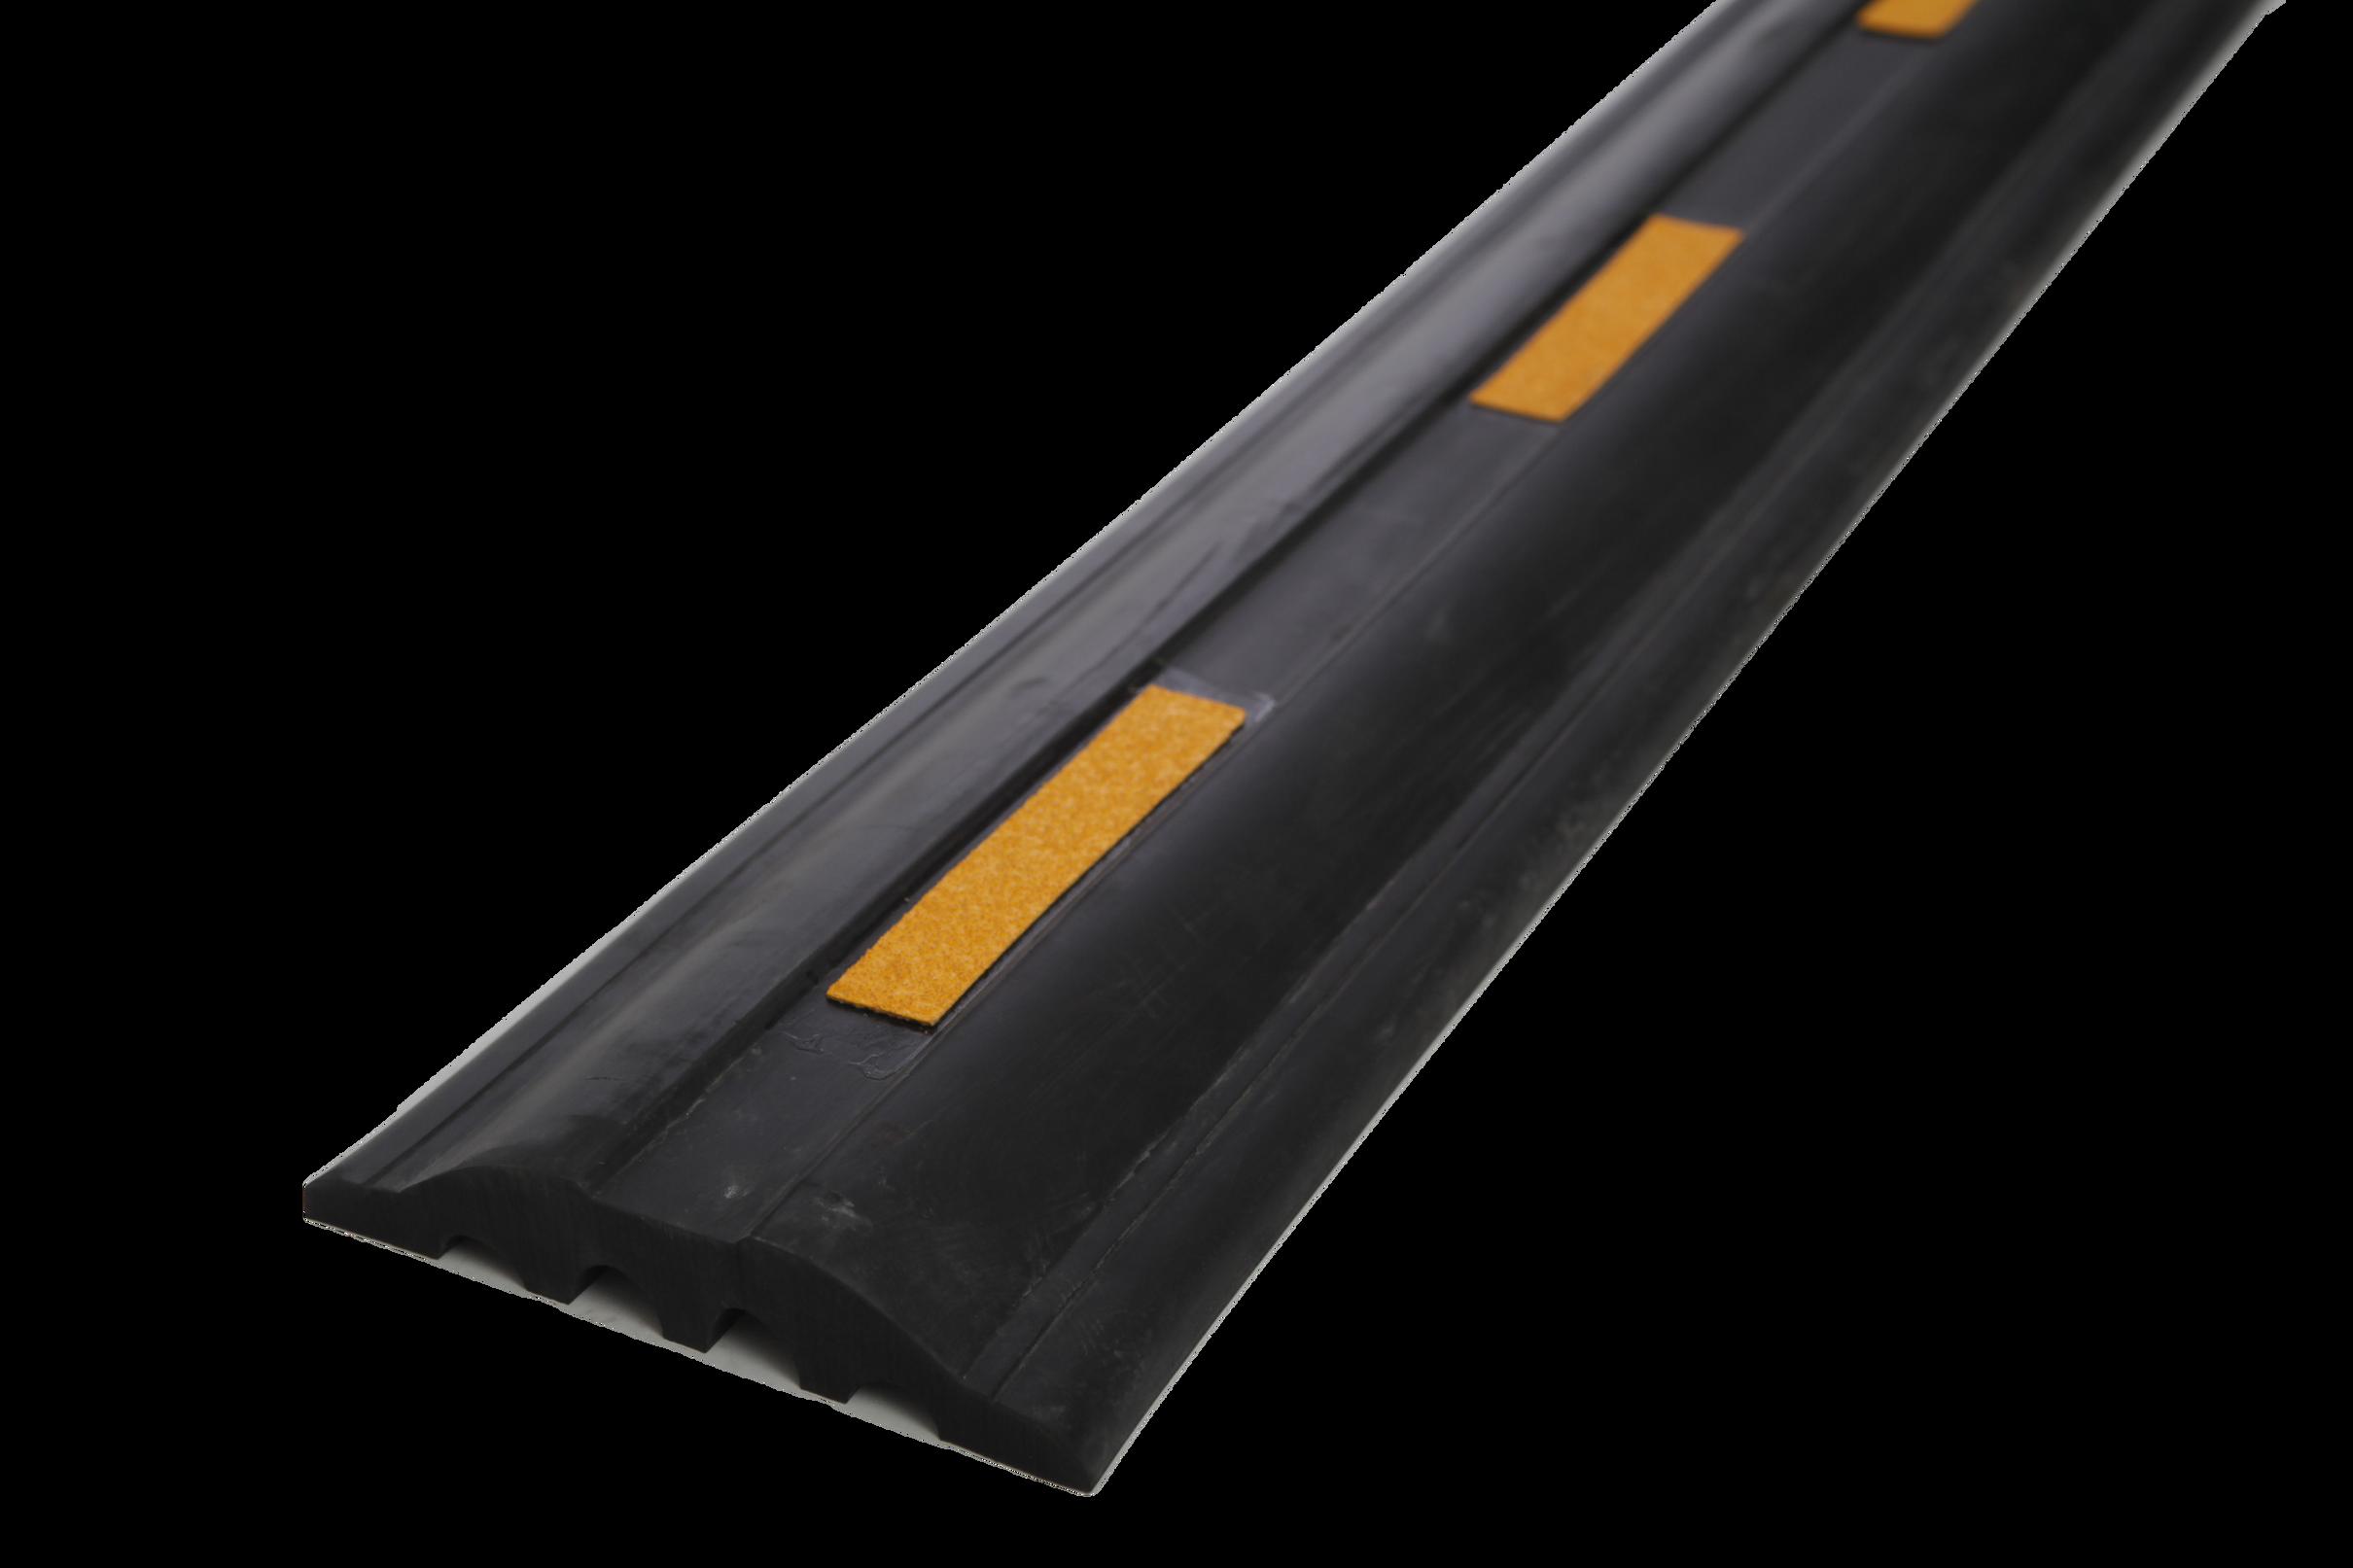 Wall rubber damper ДСР-3